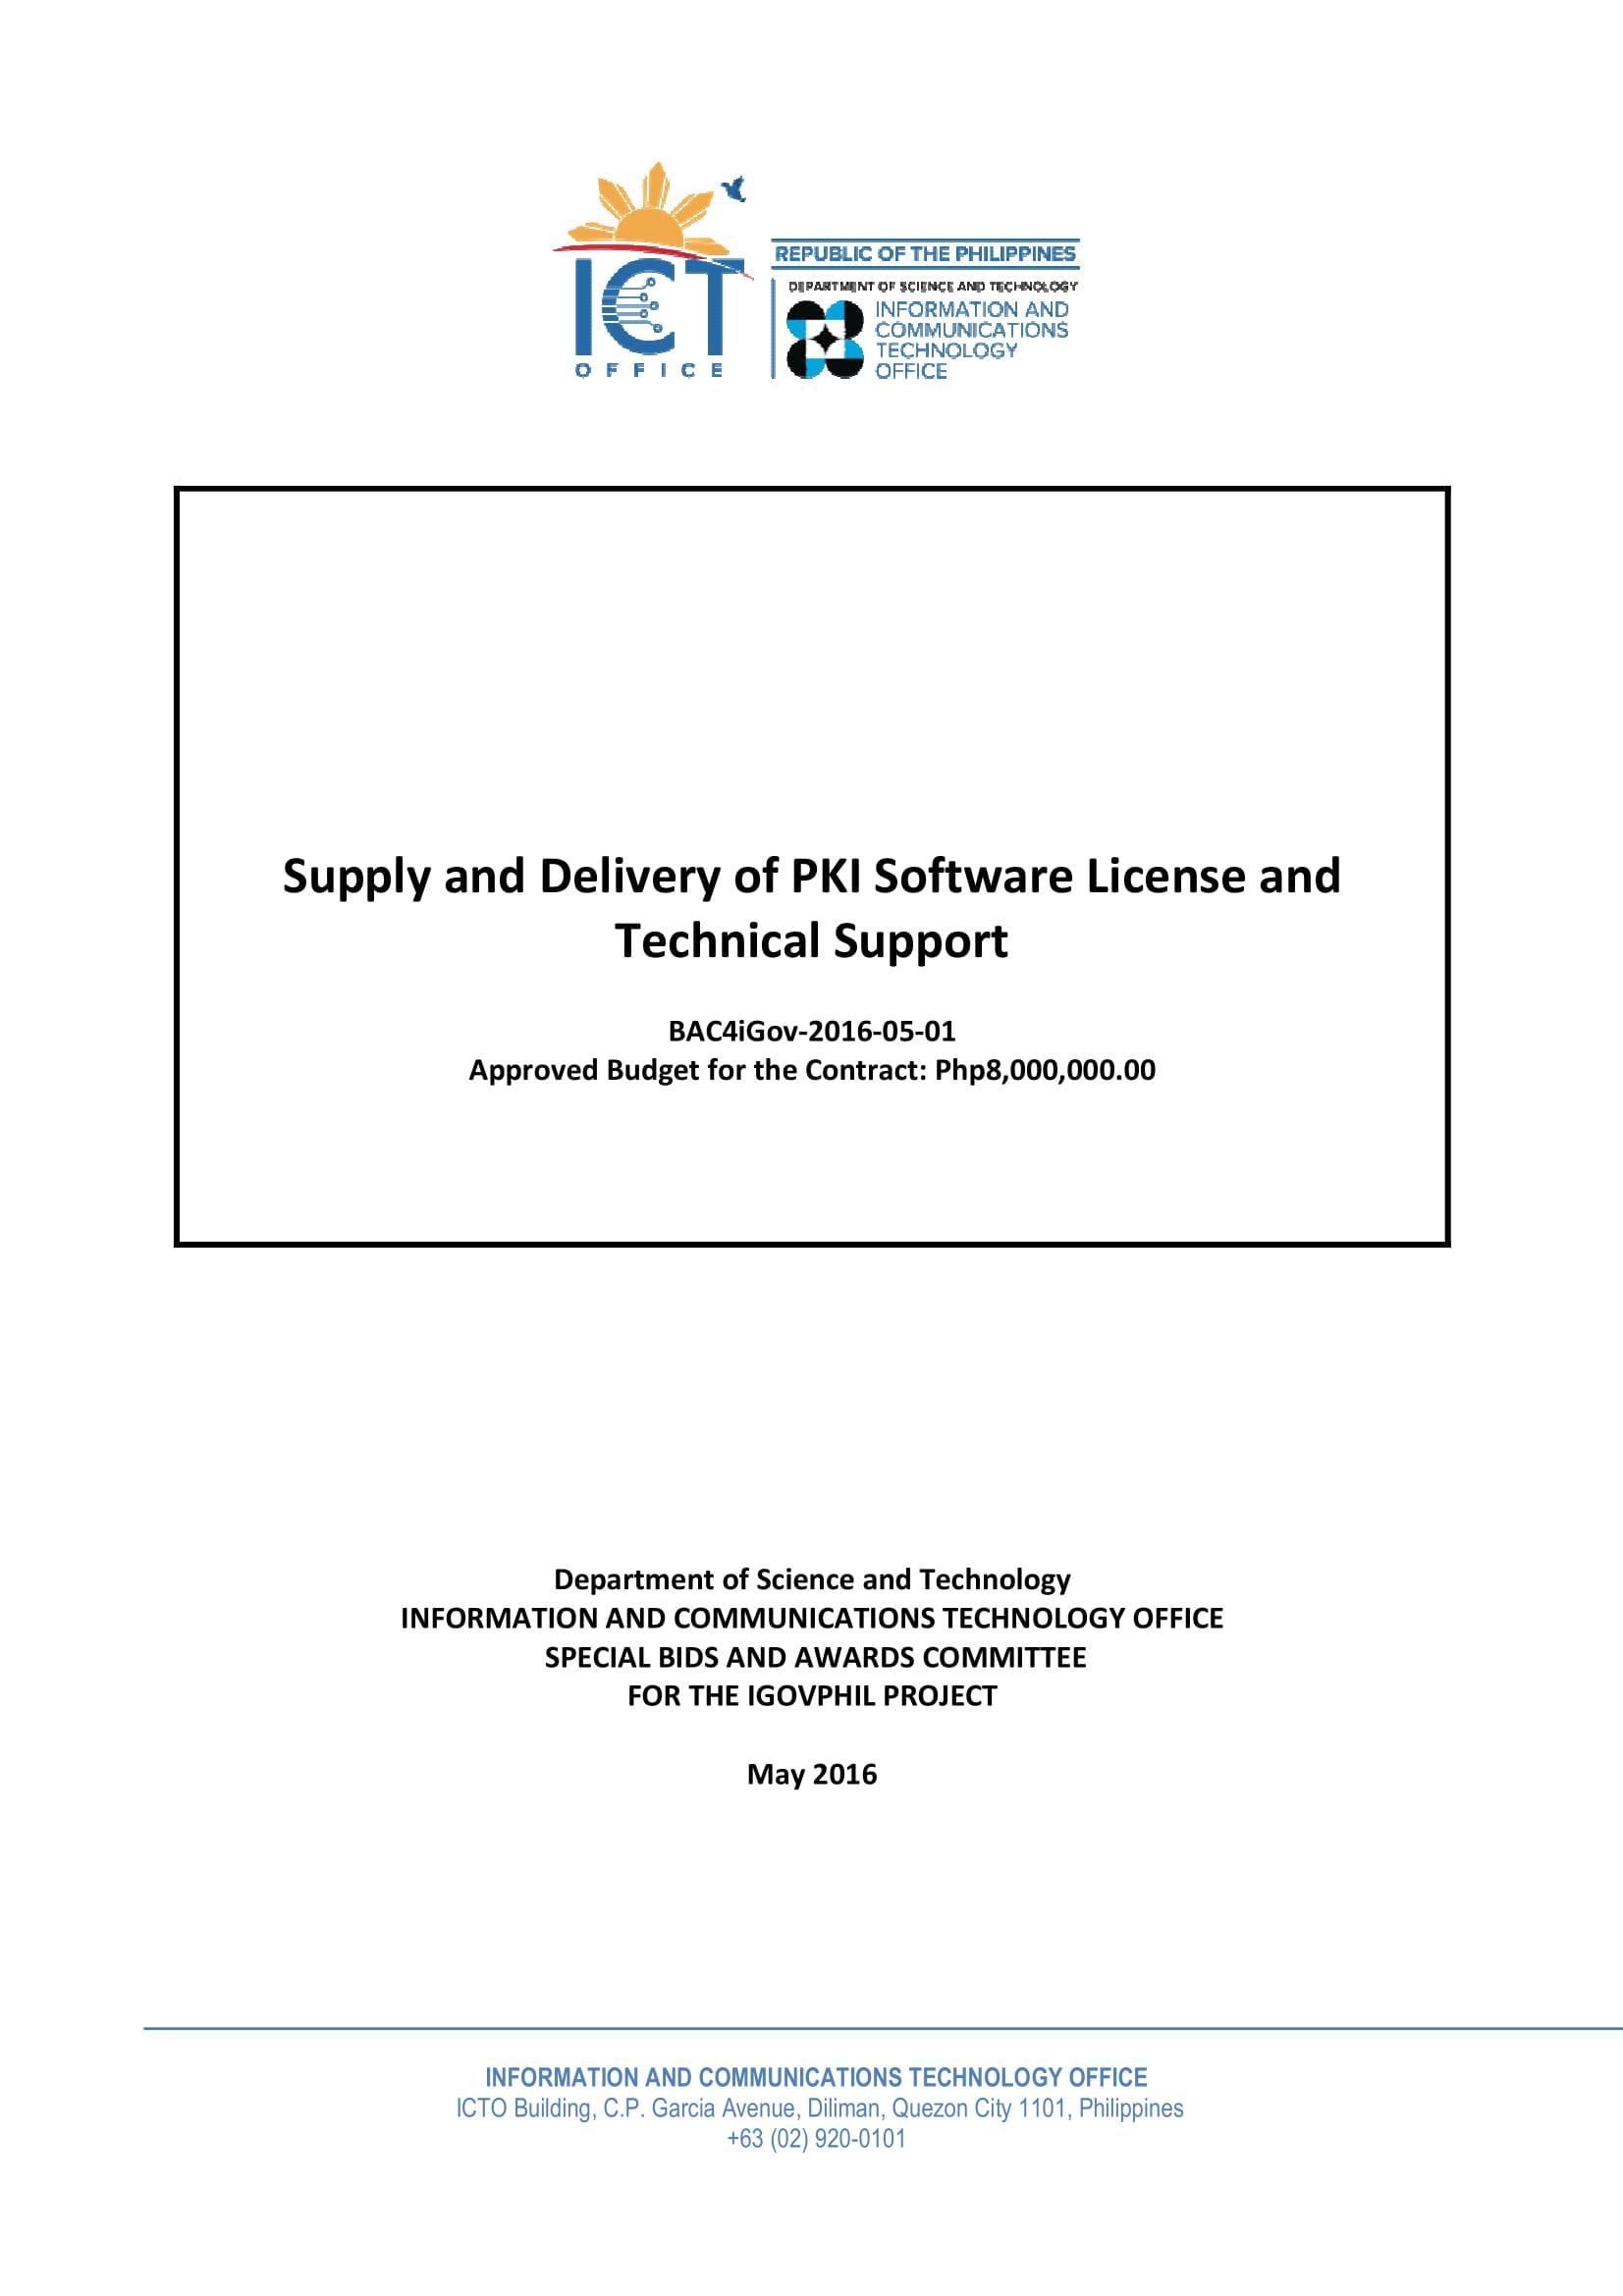 bidding documents pki software tech support